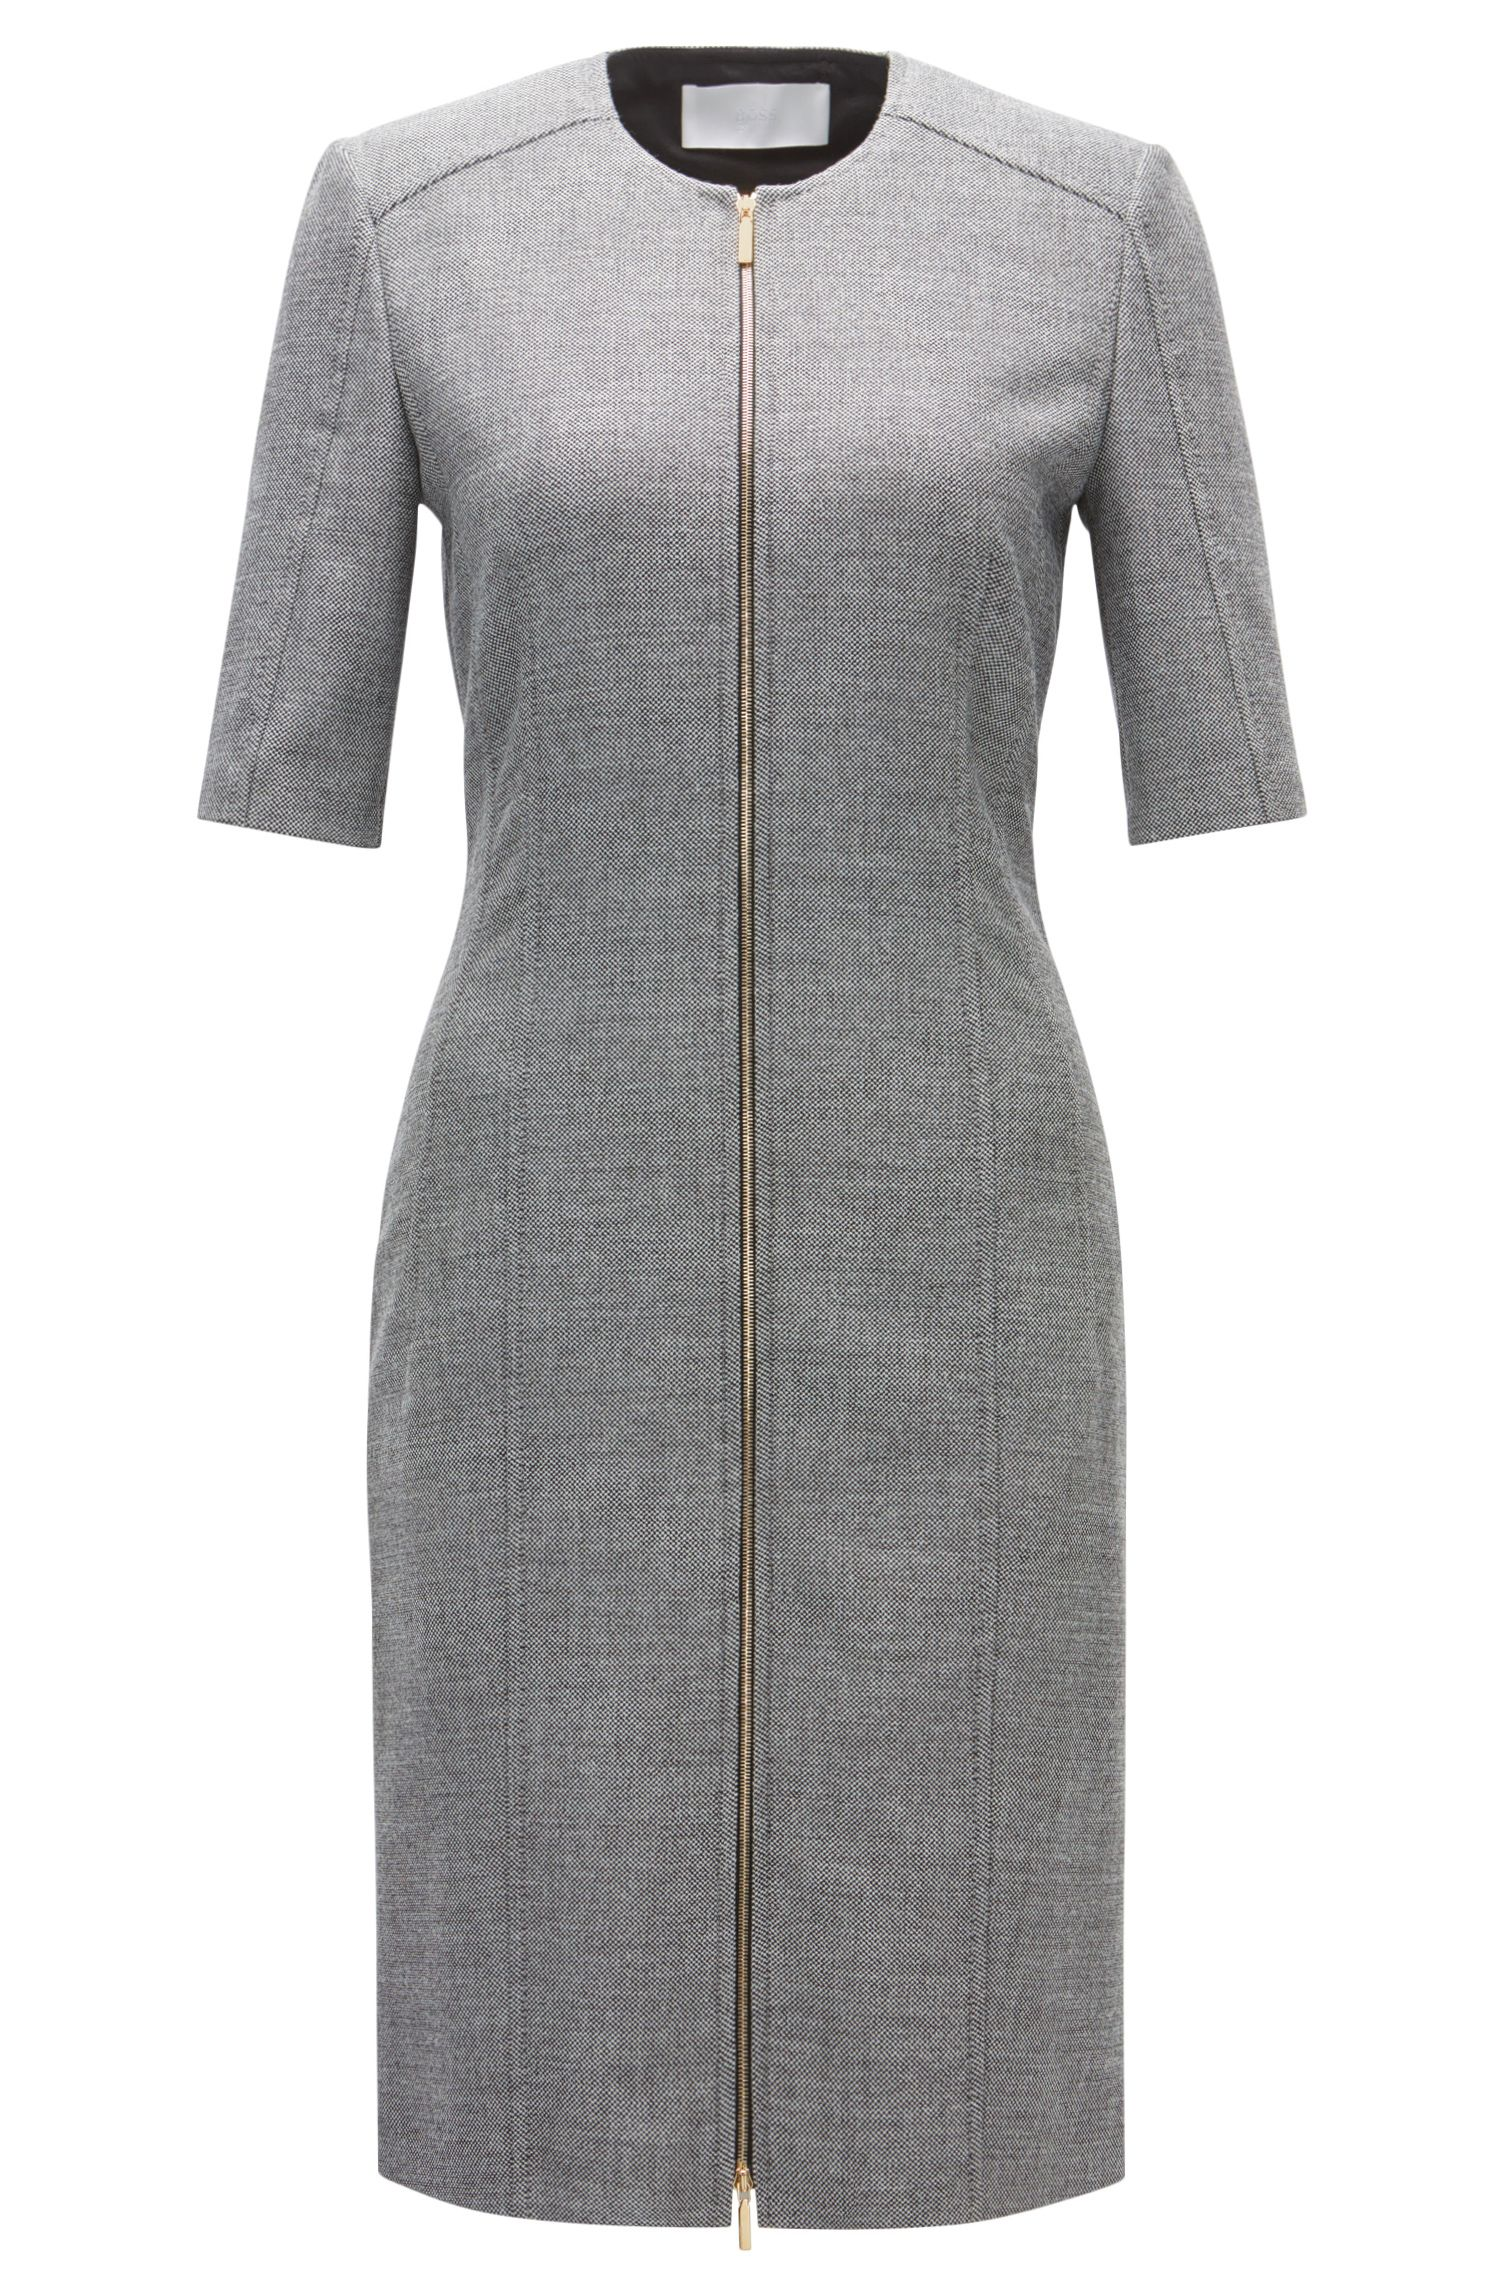 Zipped Sheath Dress | Demirana